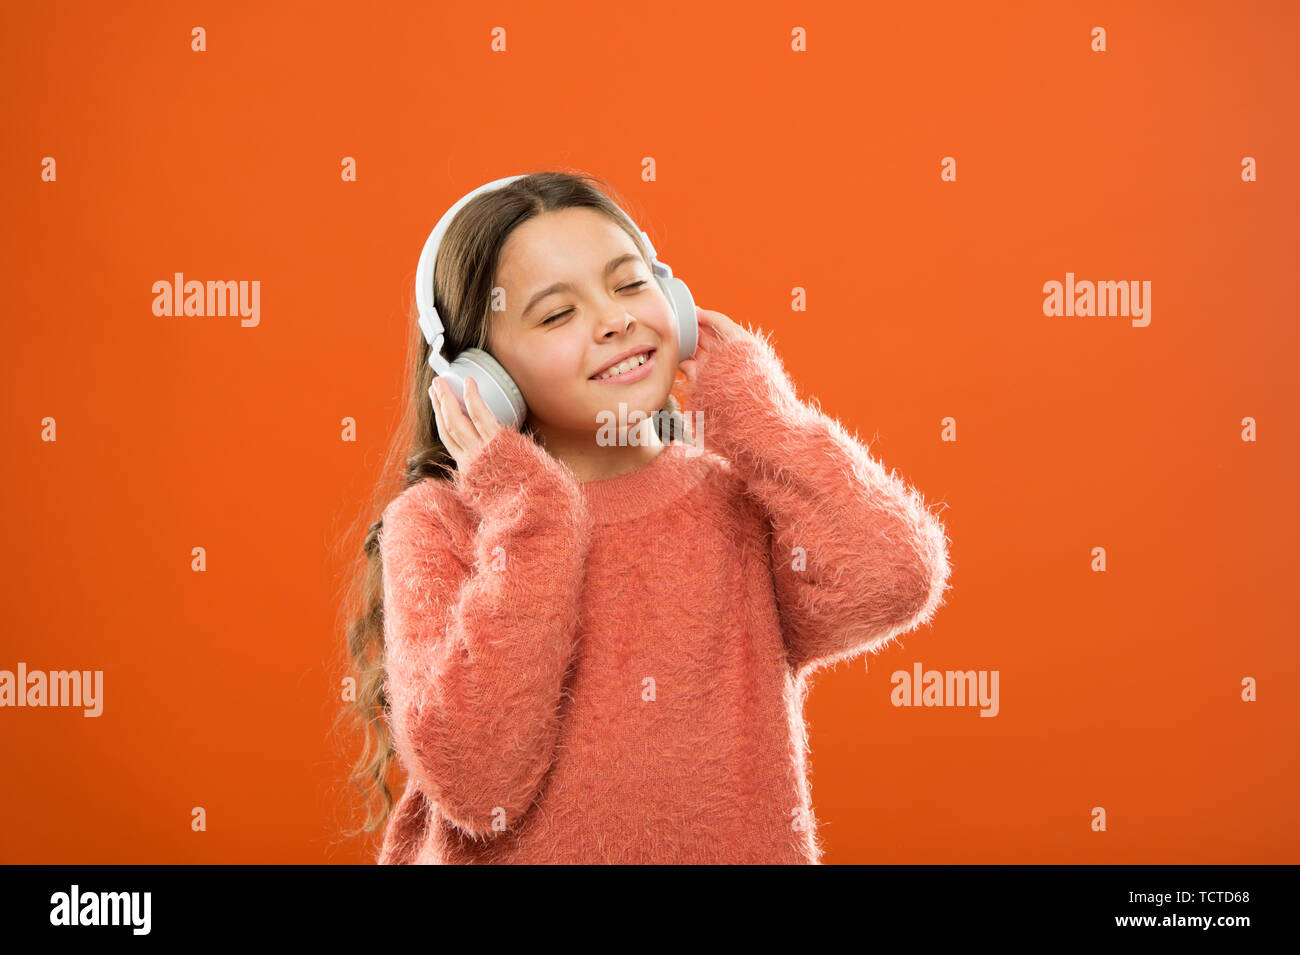 Girl cute little child wear headphones listen music kid listen music orange background recommended music based on initial interest best free music apps